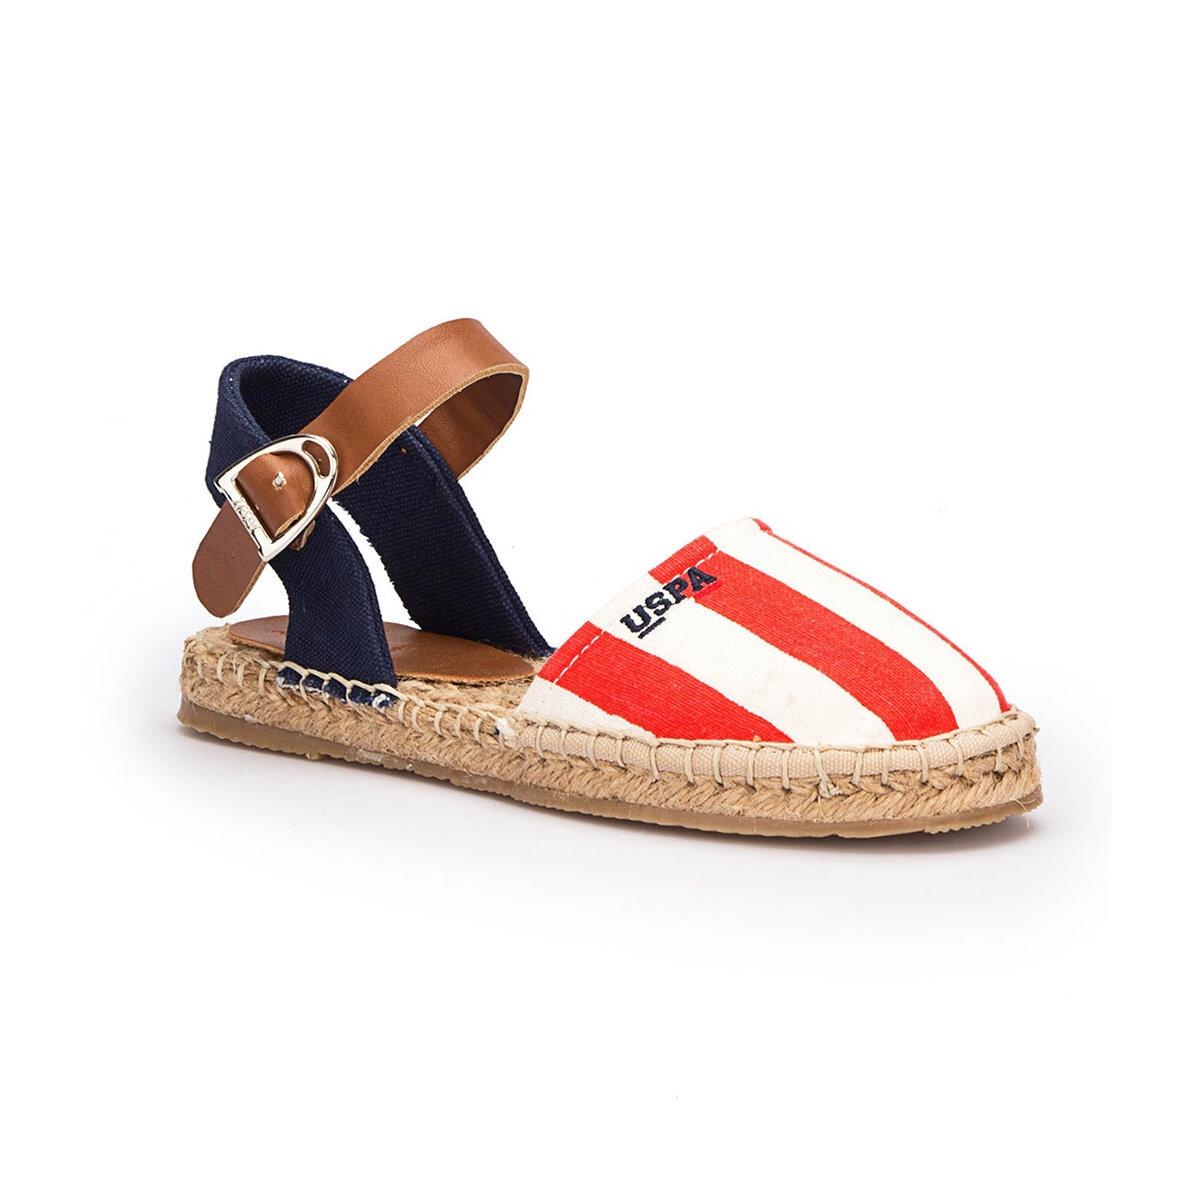 FLO LEONES Red Female Child Espadril Shoes U.S. POLO ASSN.